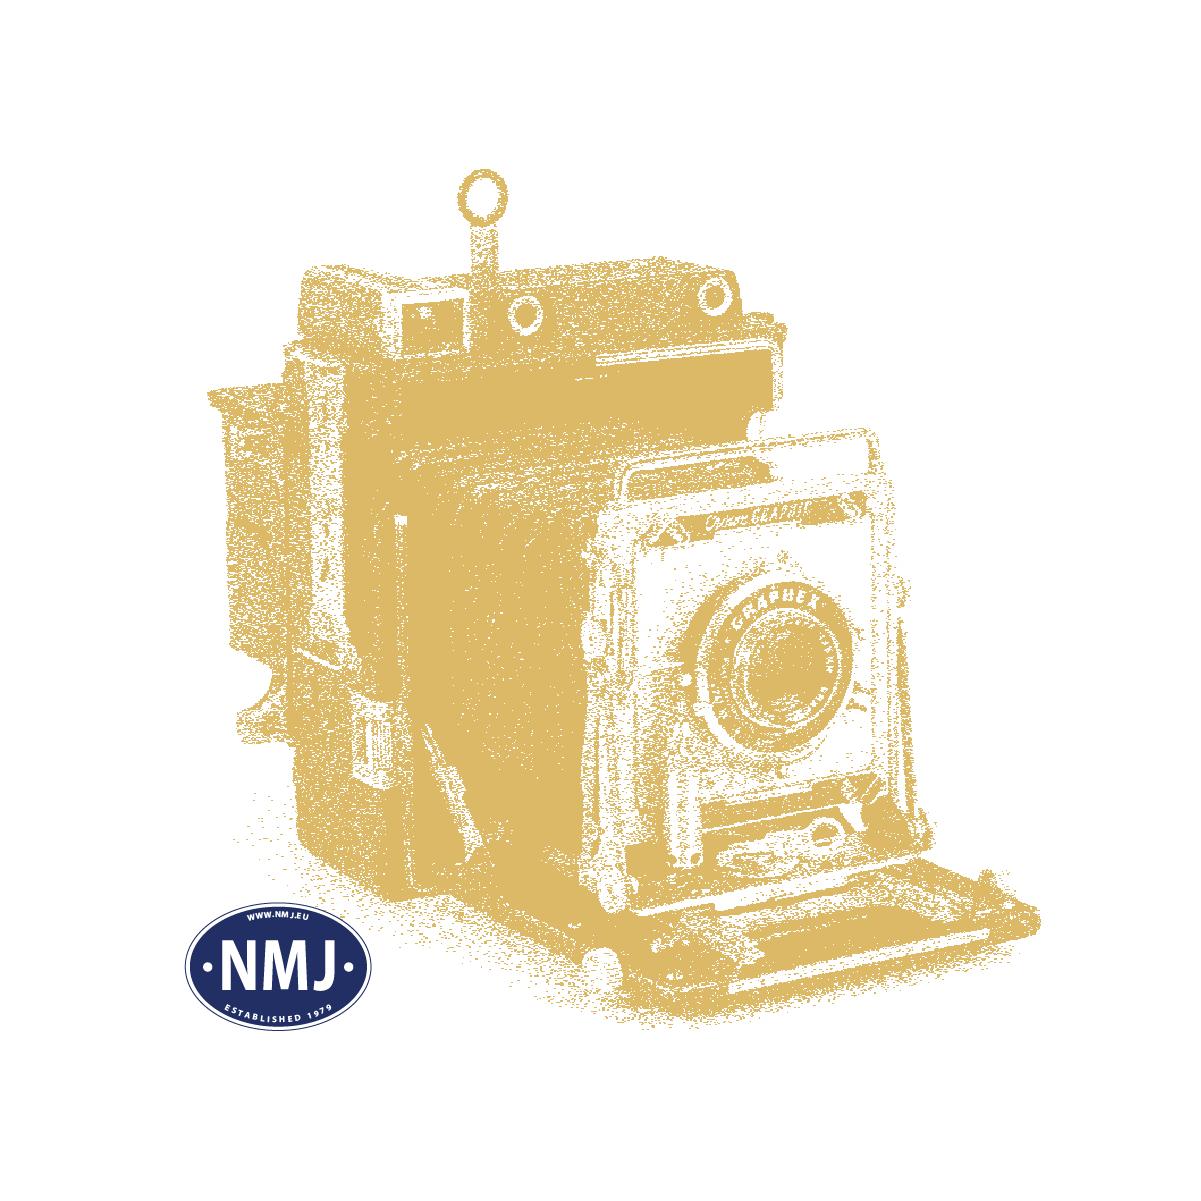 NMJT403.102 - NMJ Topline MAV Personvogn Bpmz 20-91, 2. Klasse